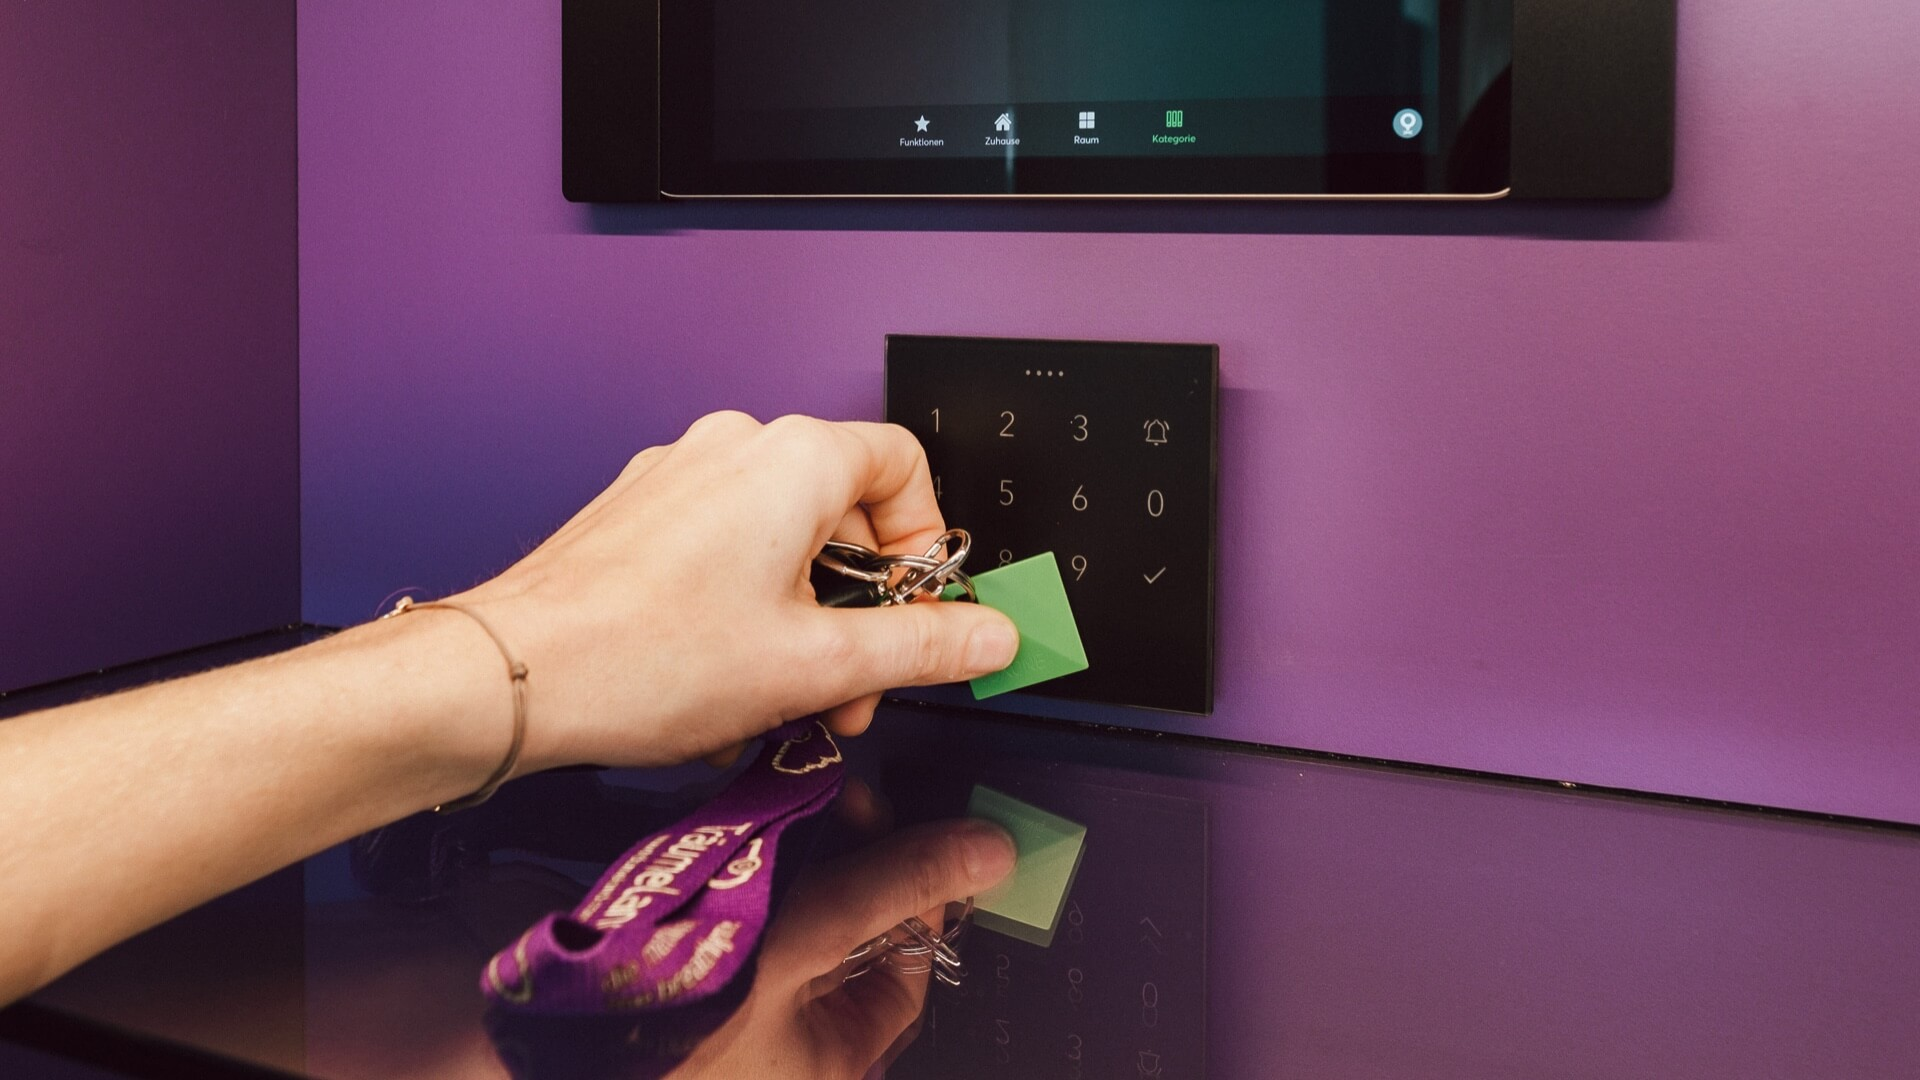 PH_Traeumeland-NFC-Code-Touch-Gallery-01@2x